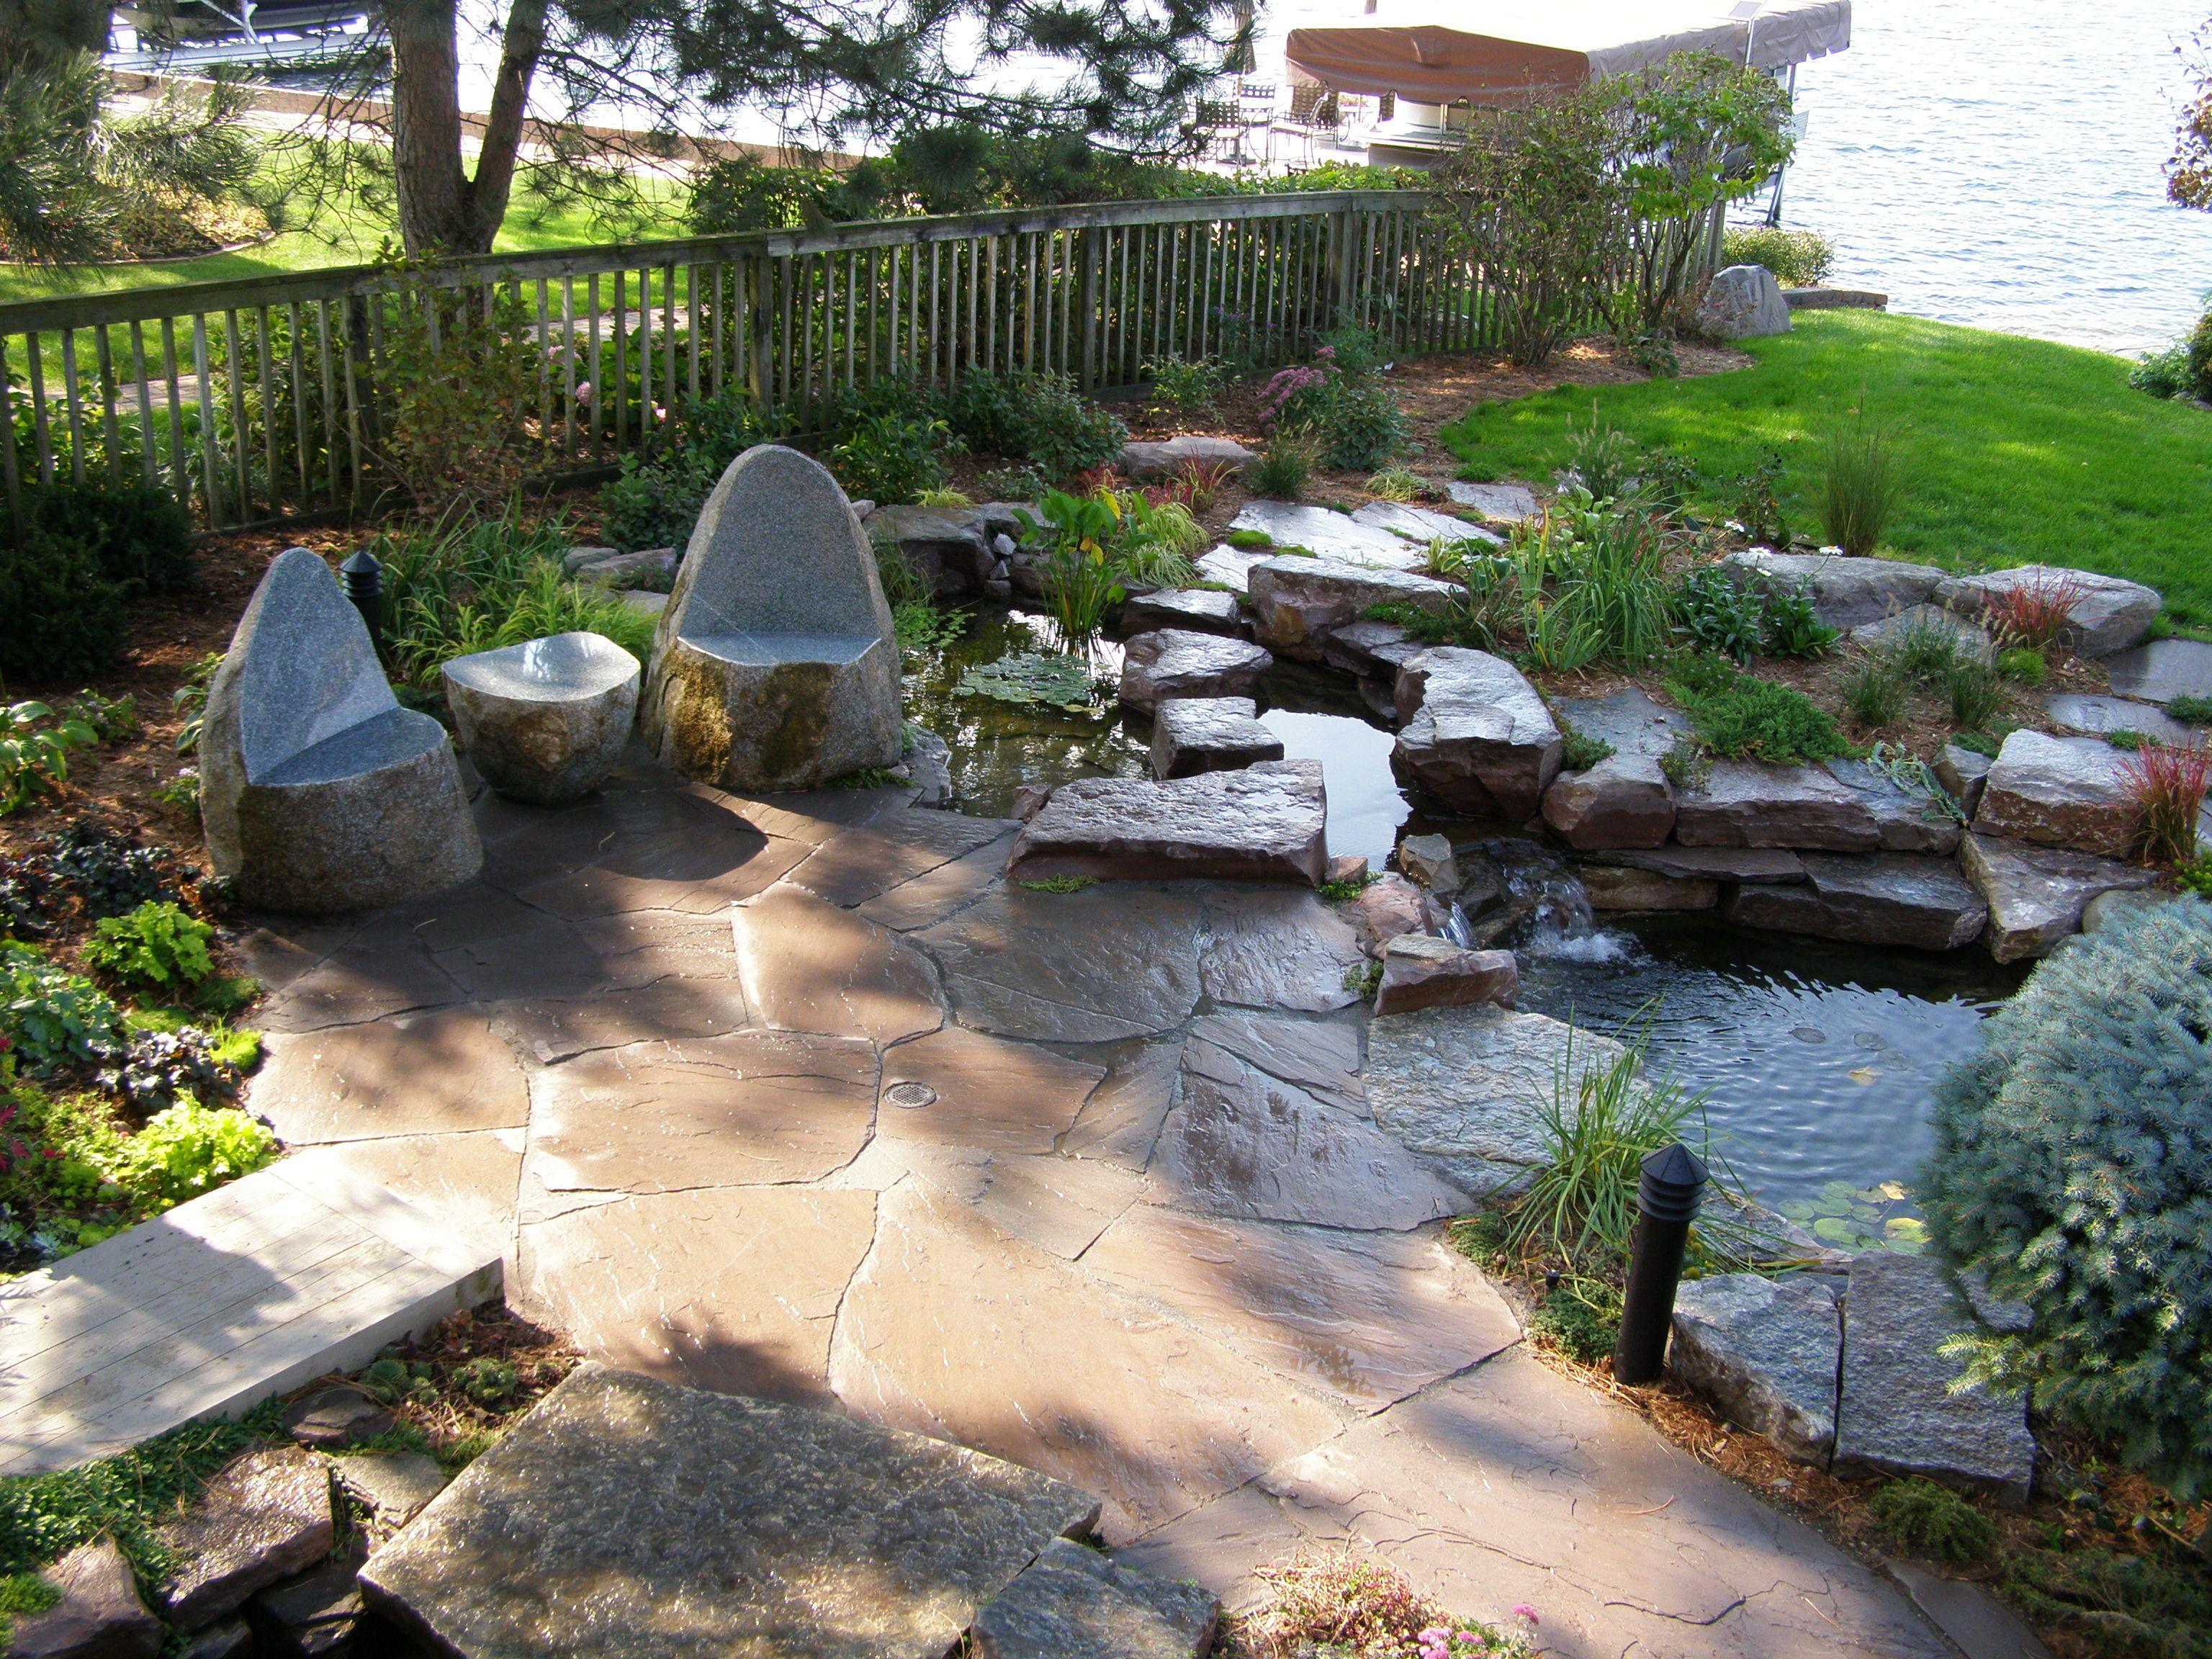 Backyard Landscaping With Natural Stone Patios Walkways Flagstone Patio Design  Idea On Yardbackyard